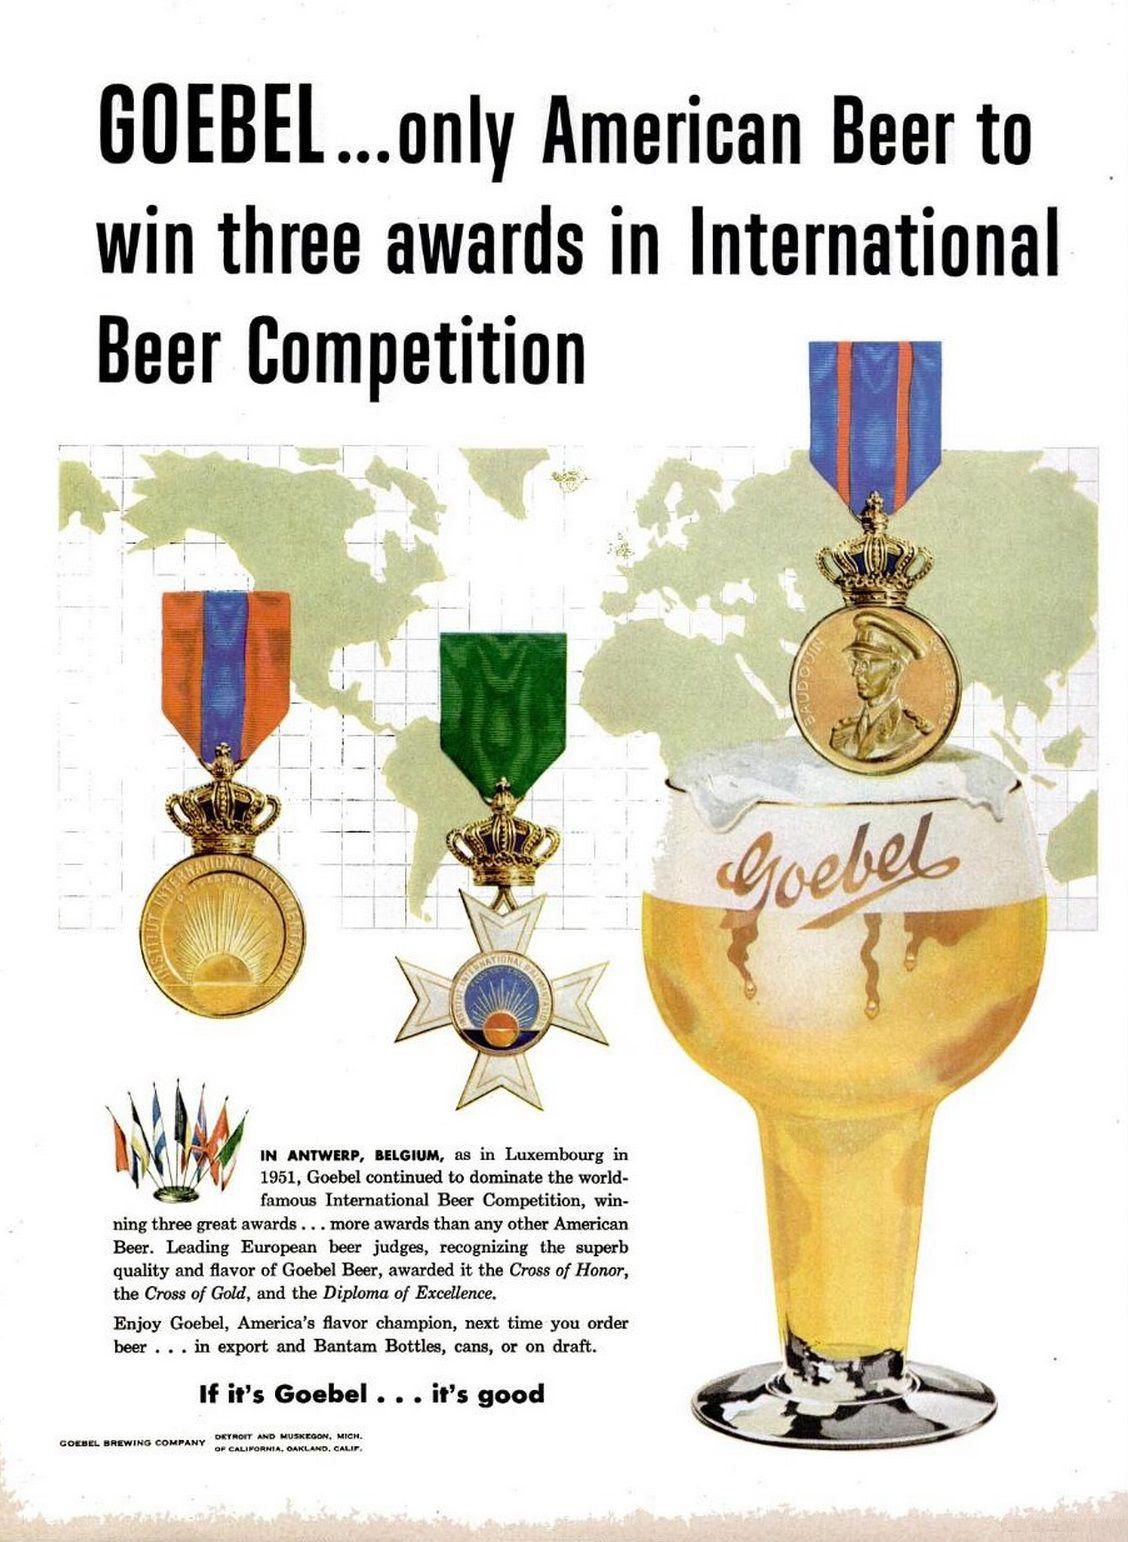 Goebel beer advert life april 3 1953 american beer